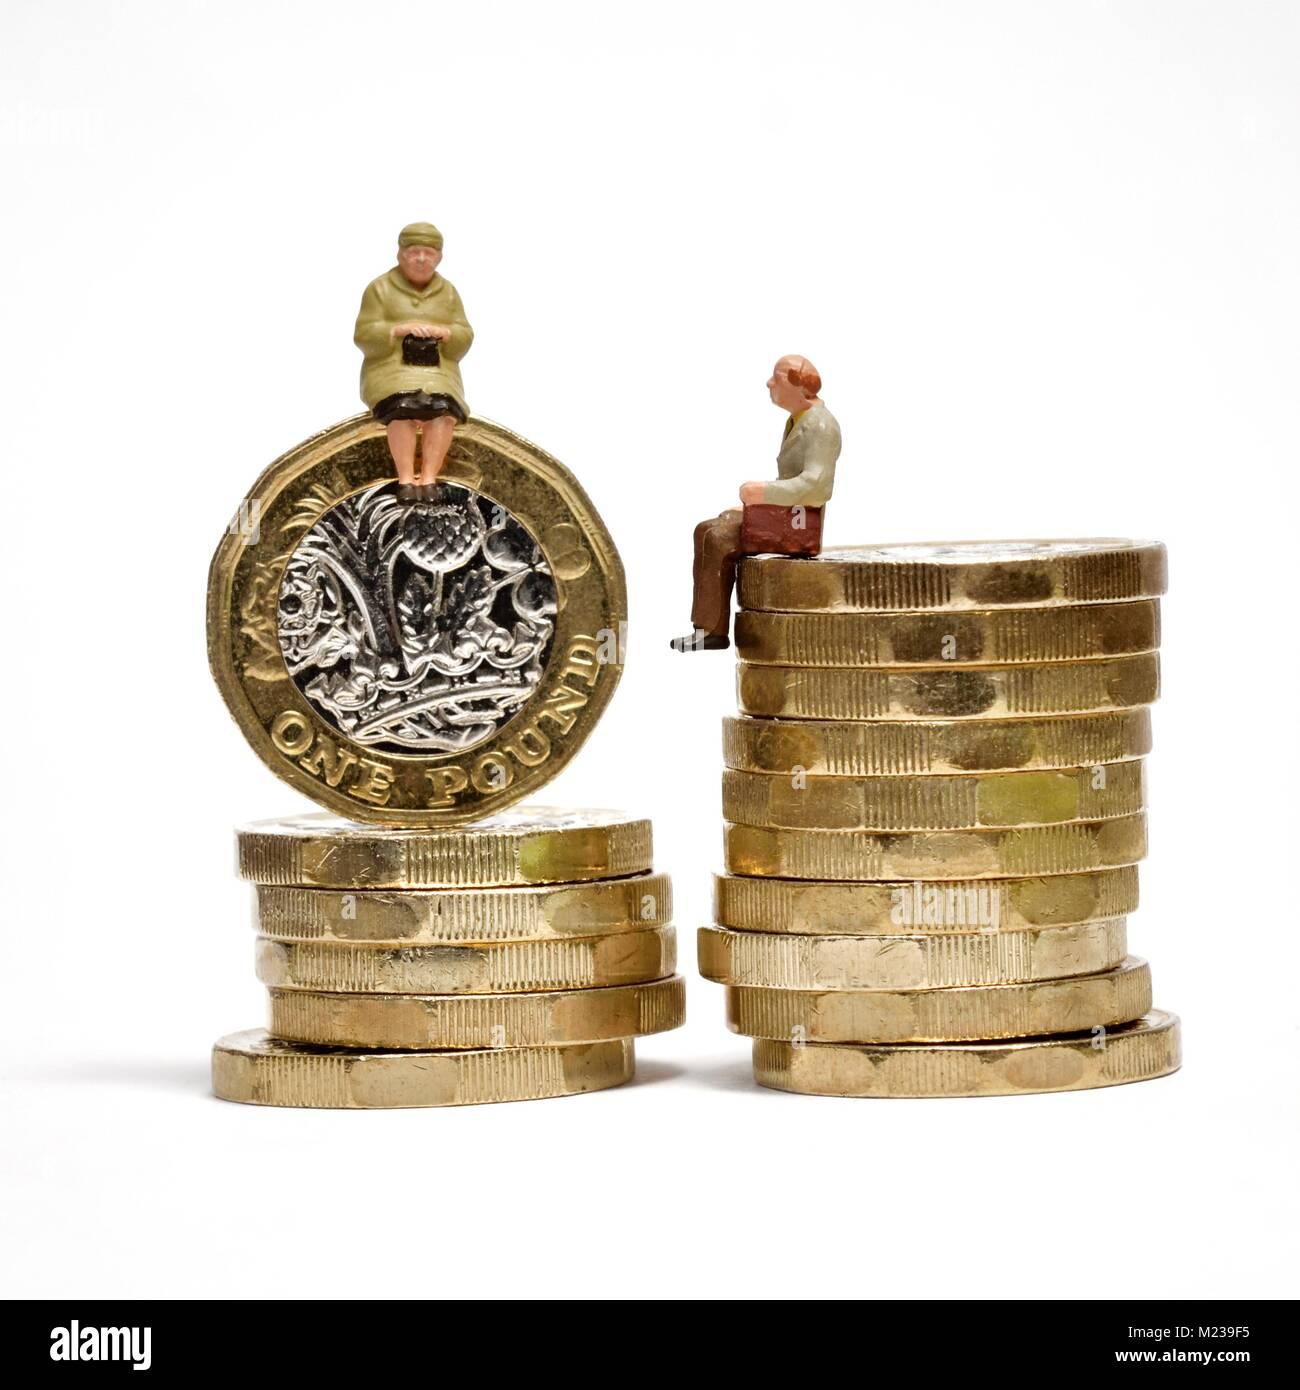 Pension gap retirement income concept - Stock Image